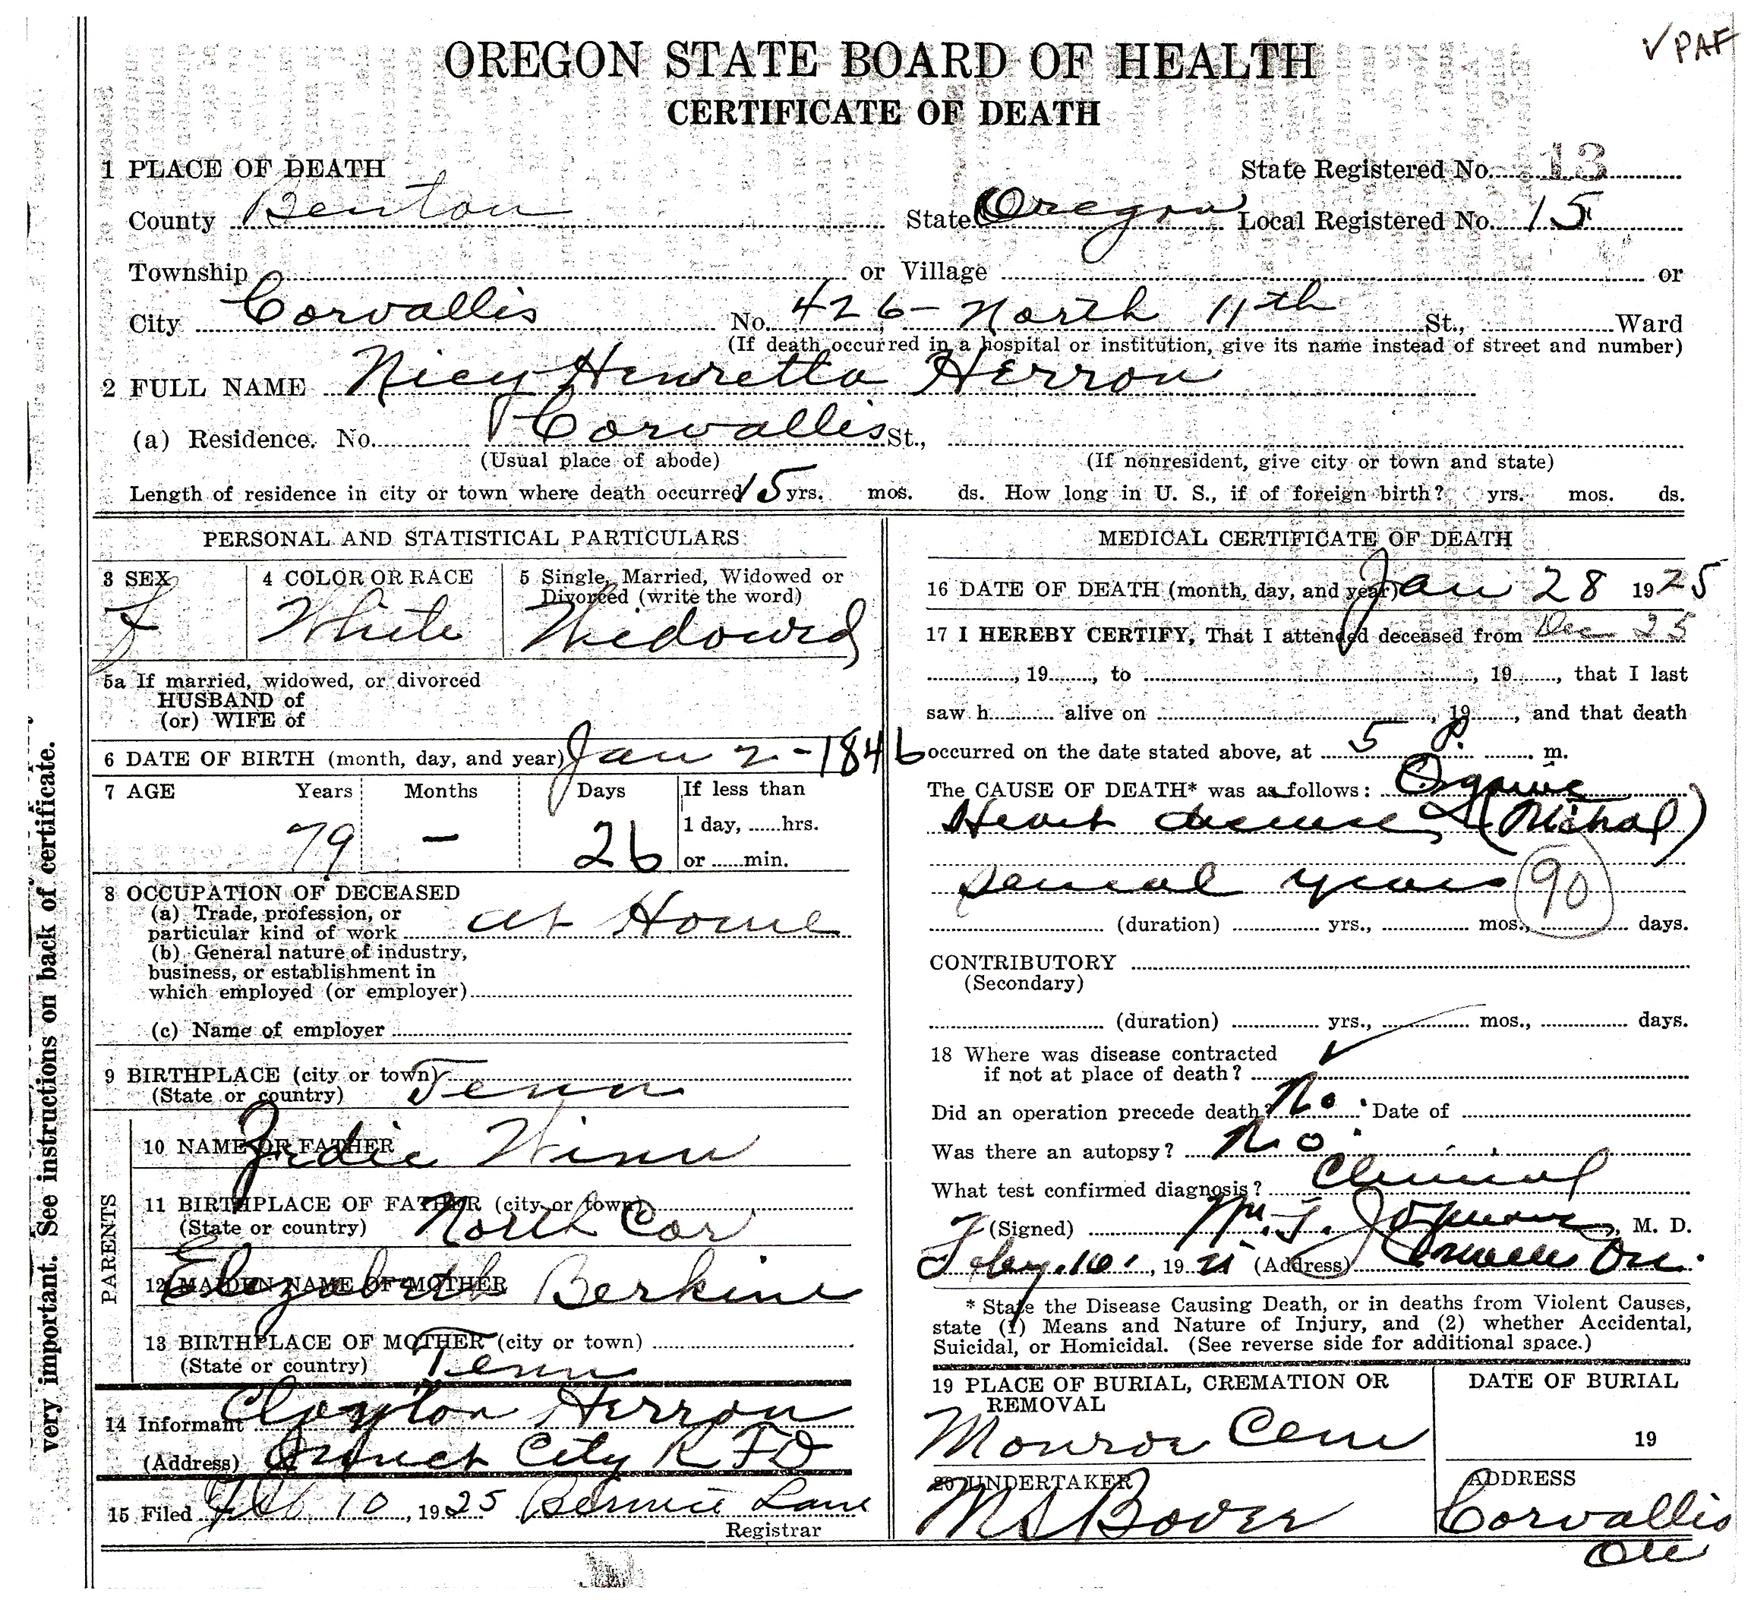 Zadok winn 1799 1852 bob oregon death certificate 28 jan 1925 nicy henretta herron father zedic winn mother elizabeth berkine 1betcityfo Choice Image